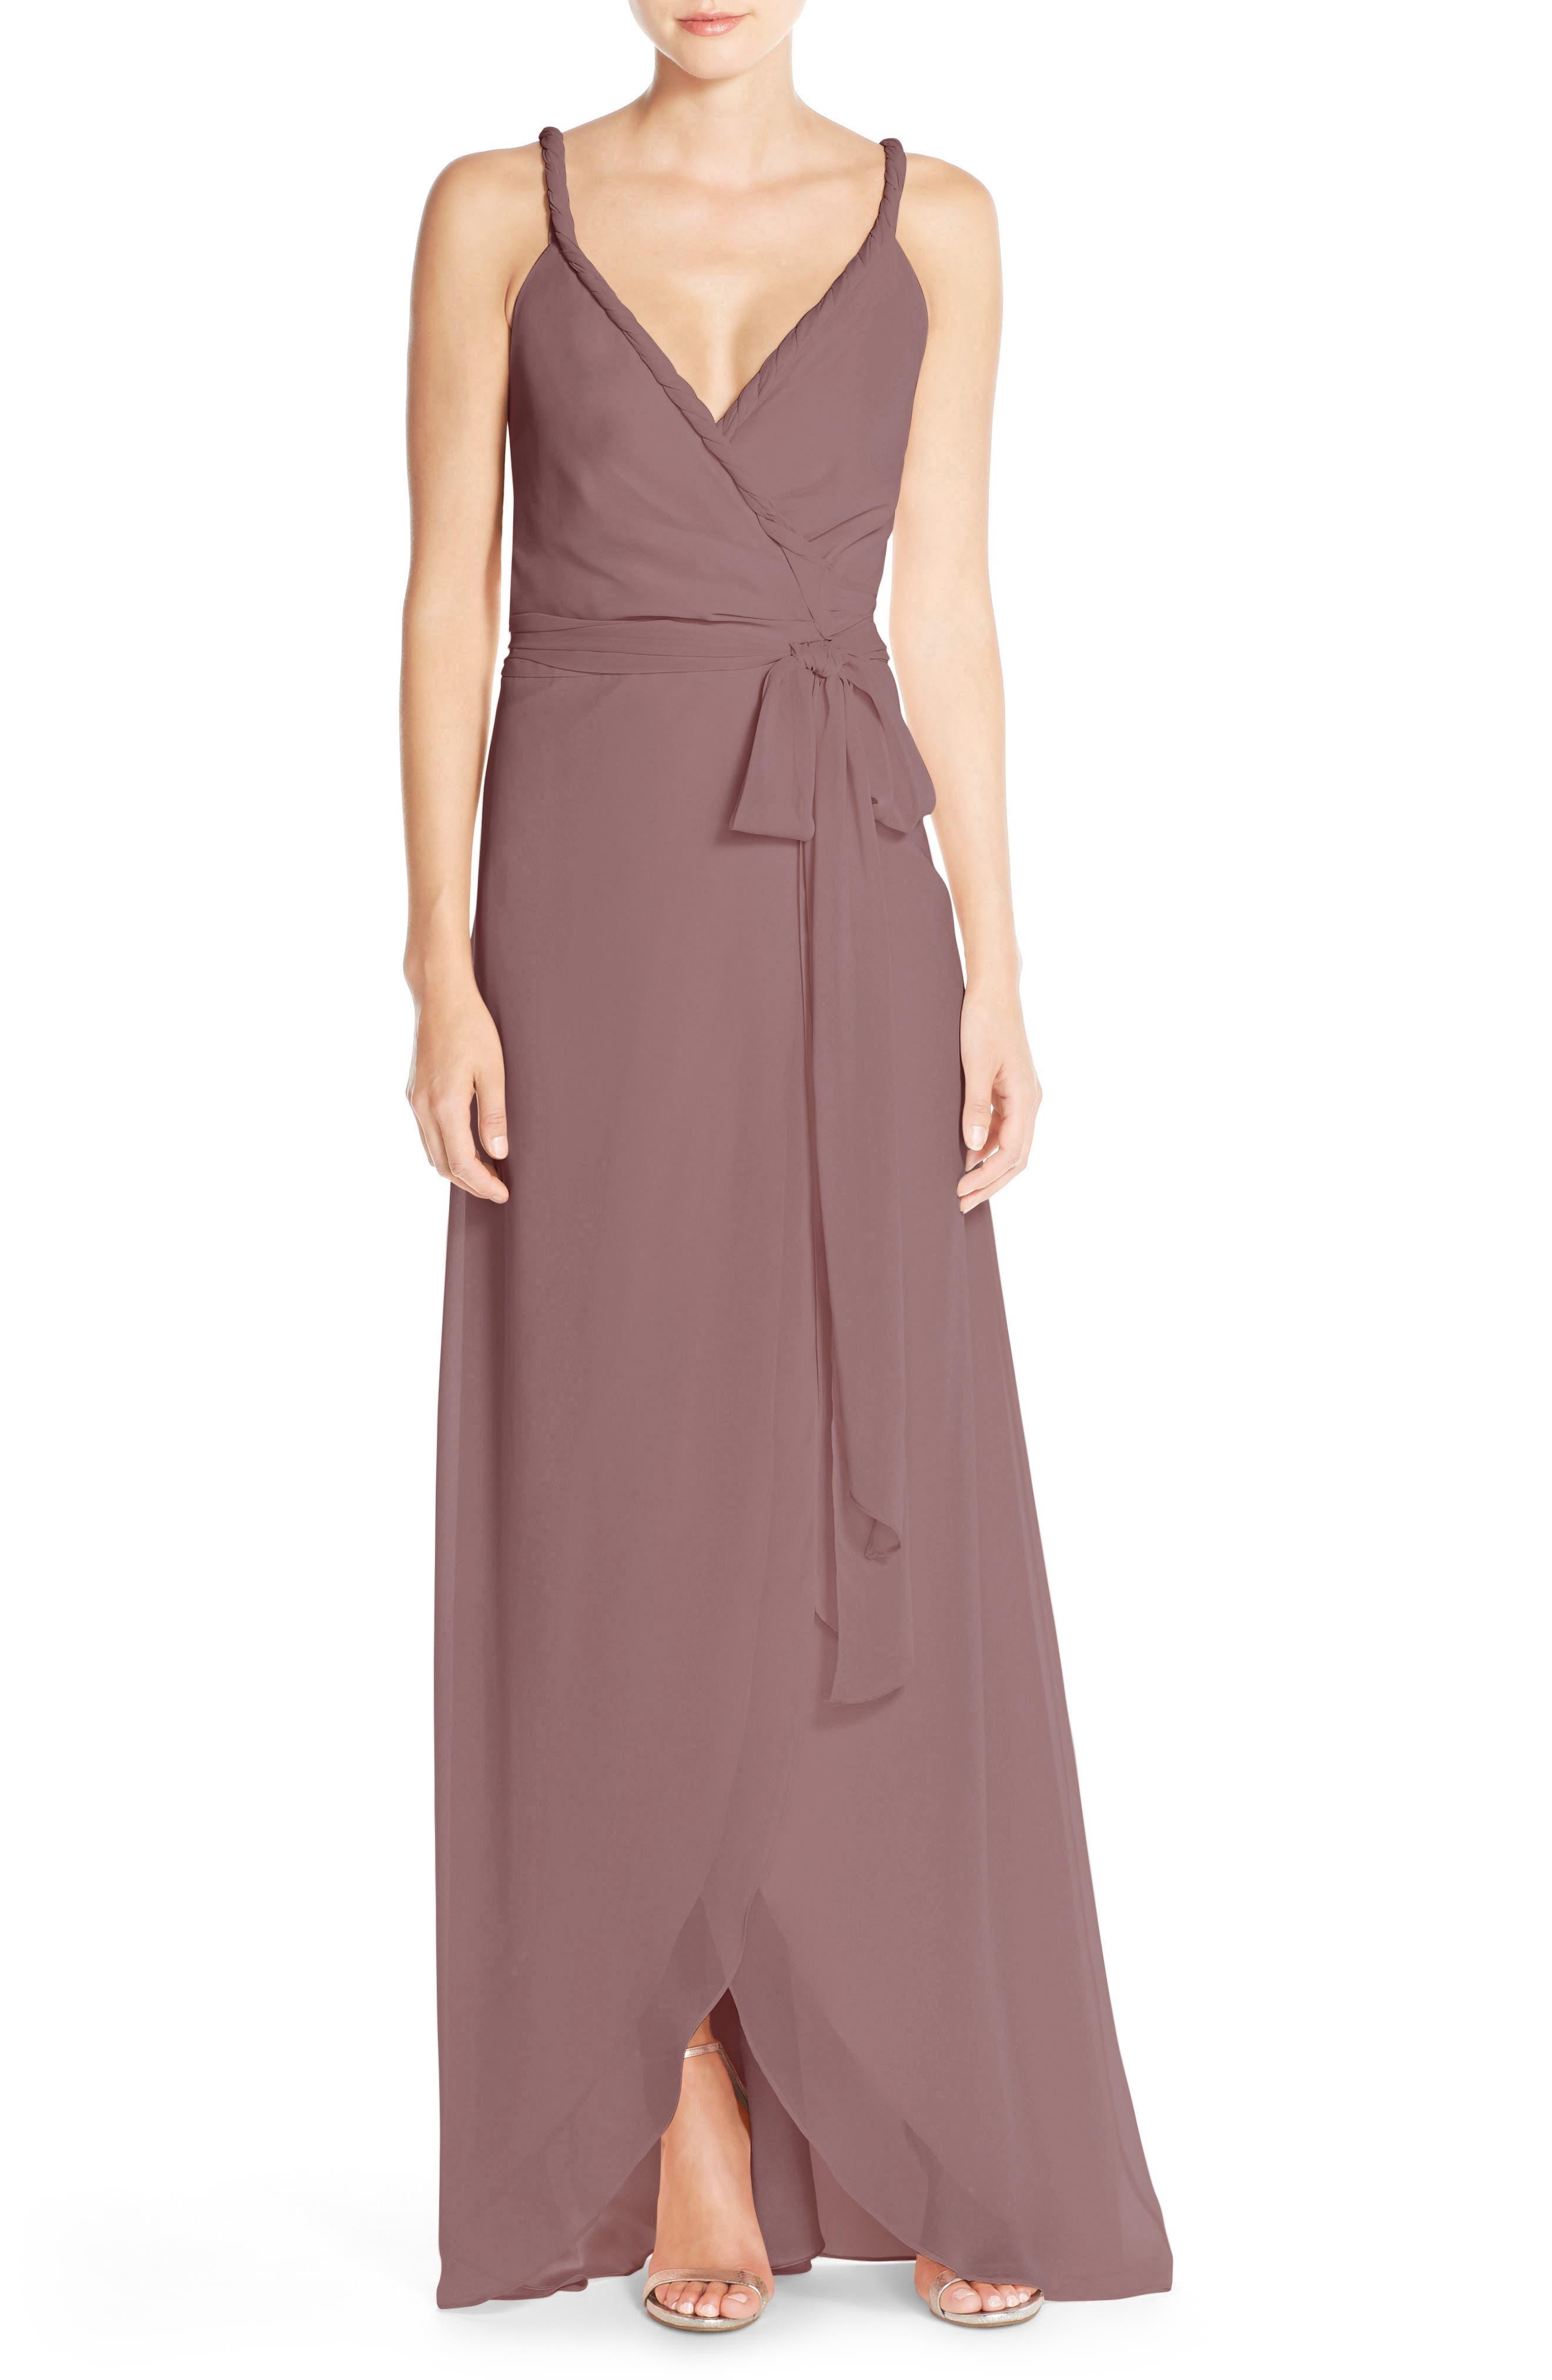 JOANNA AUGUST,                             Parker Twist Strap ChiffonWrap Gown,                             Alternate thumbnail 2, color,                             652